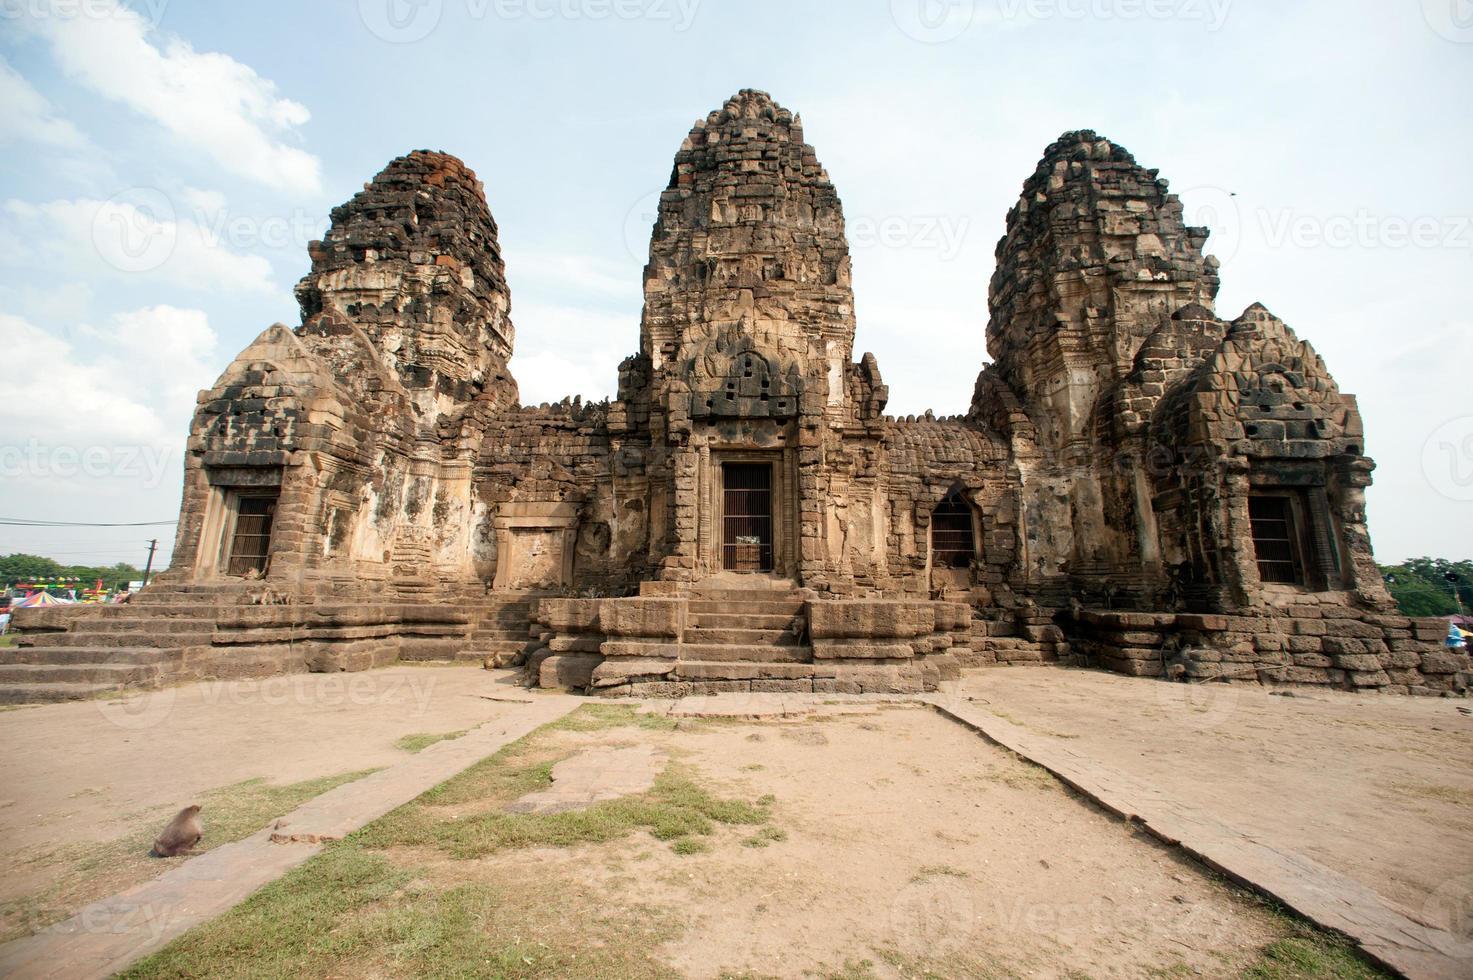 Phra Prang Sam Yod temple in Thailand. photo